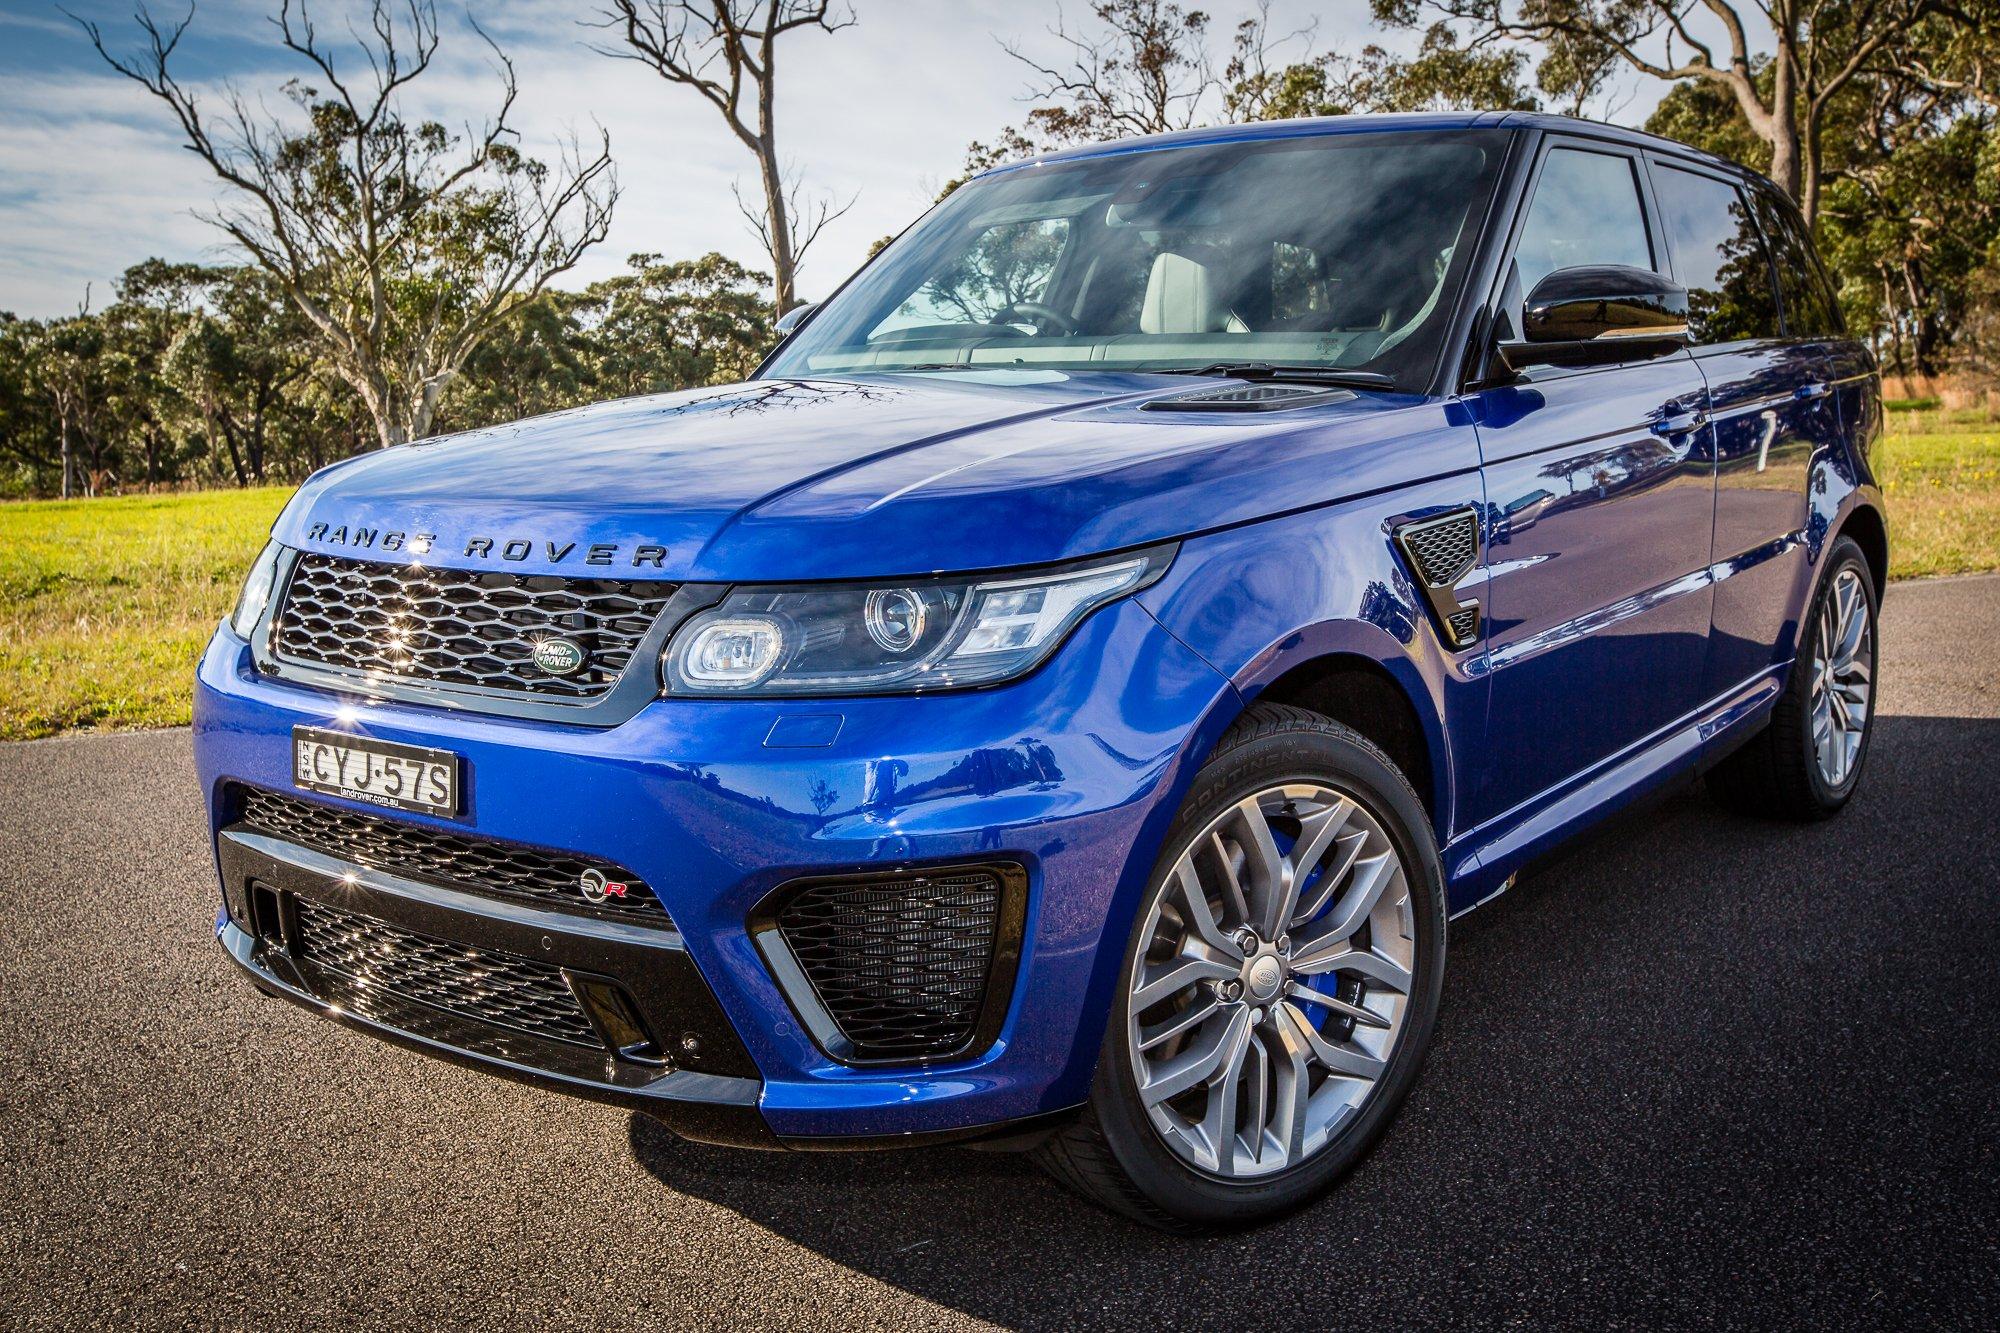 2015 Range Rover Sport Svr Review Photos Caradvice